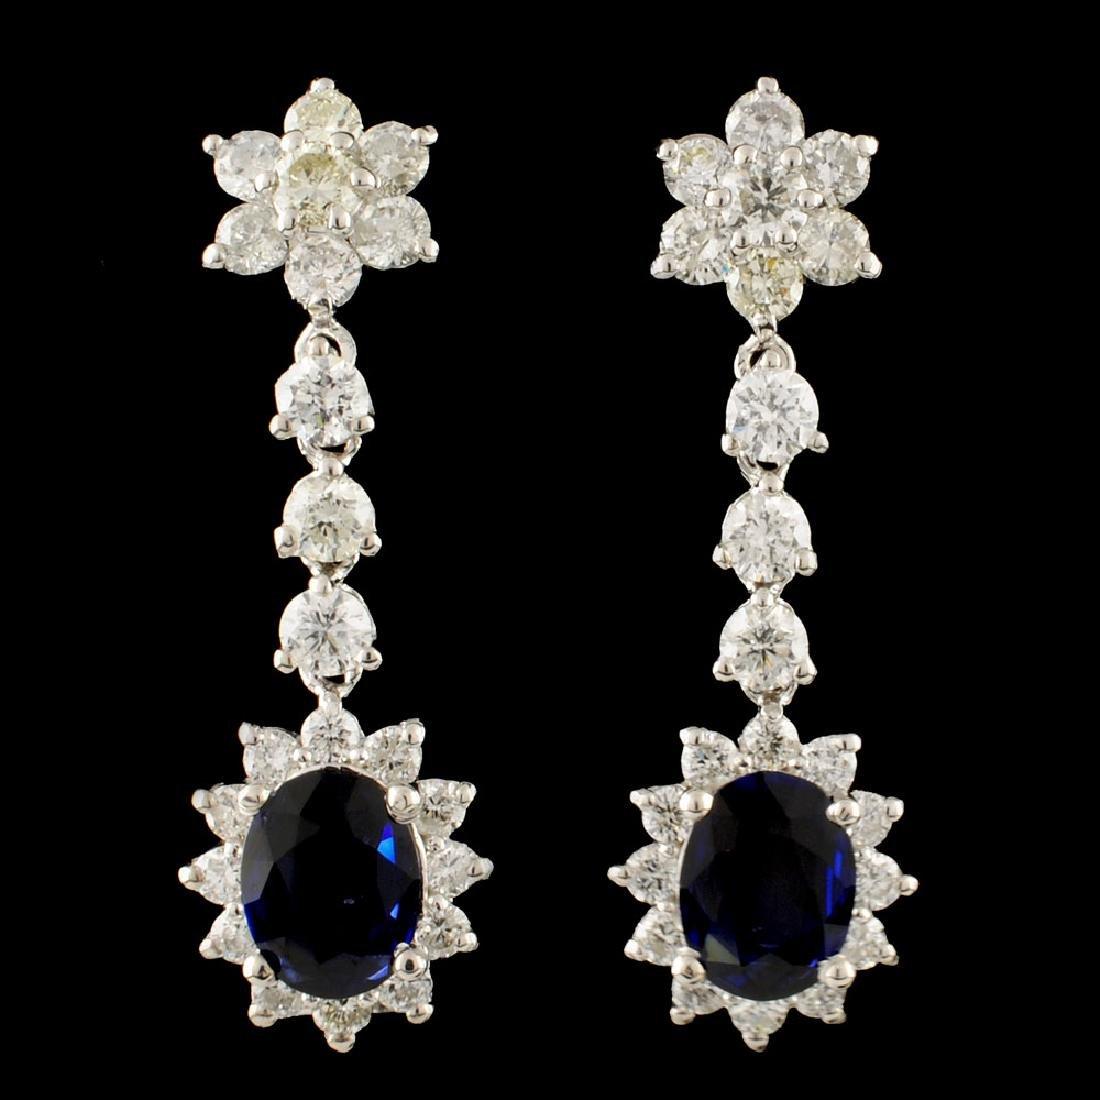 14K Gold 1.92ct Sapphire & 2.41ctw Diamond Earring